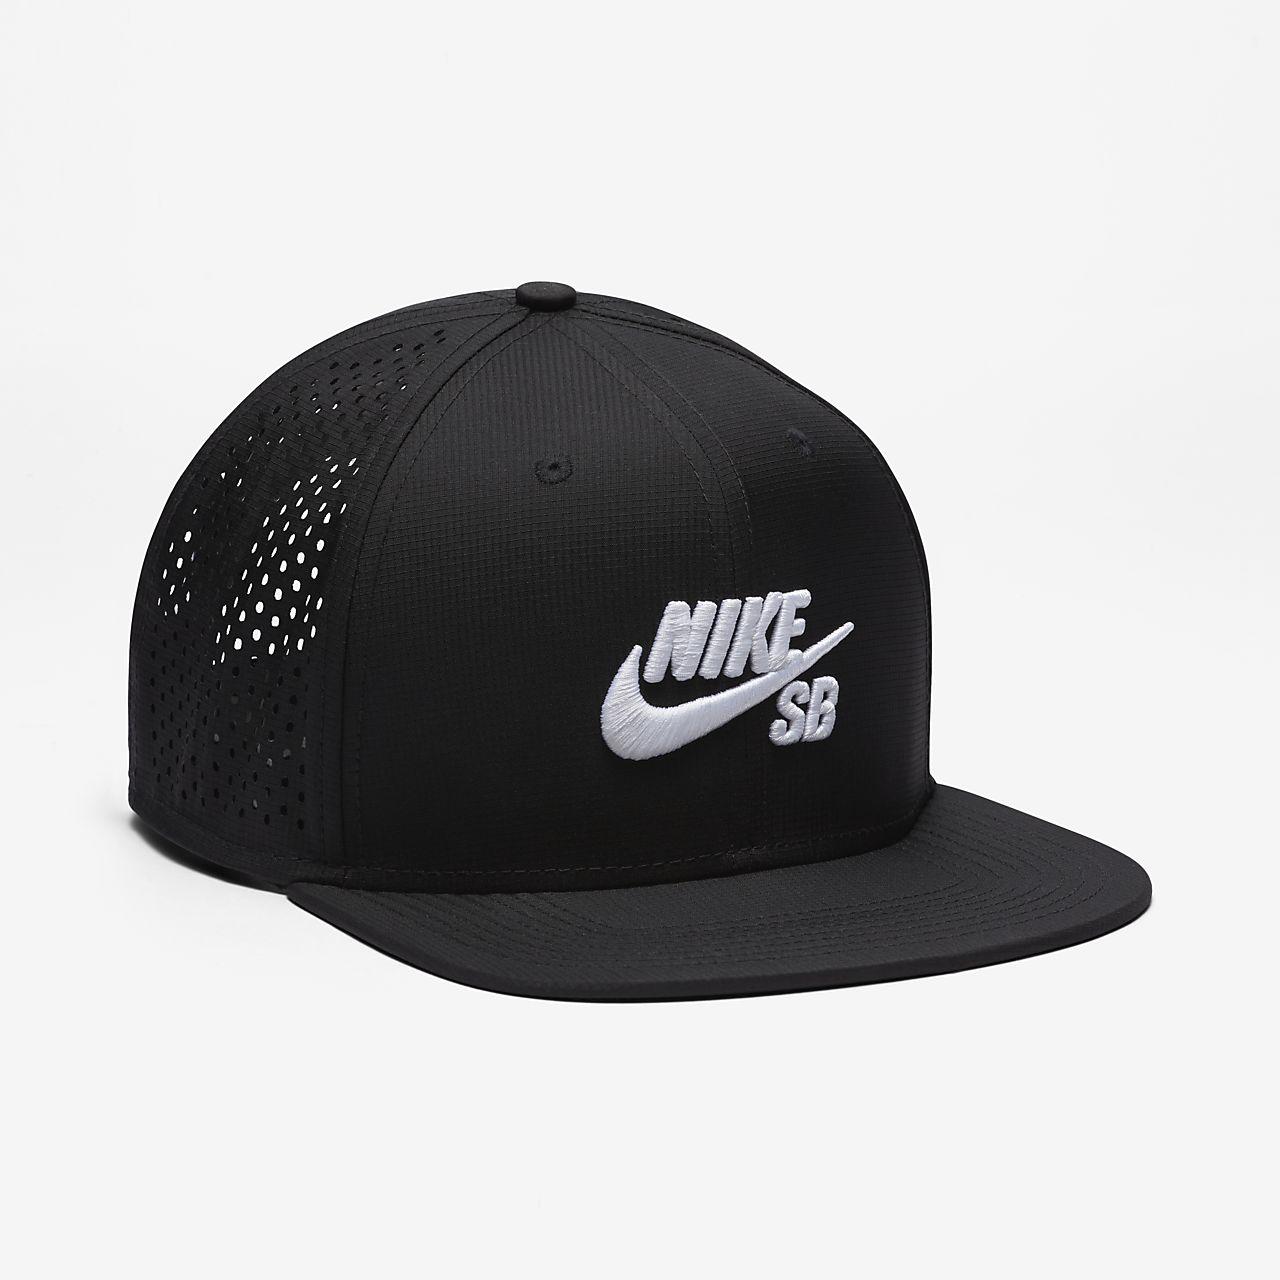 ... Nike SB Performance Trucker Hat